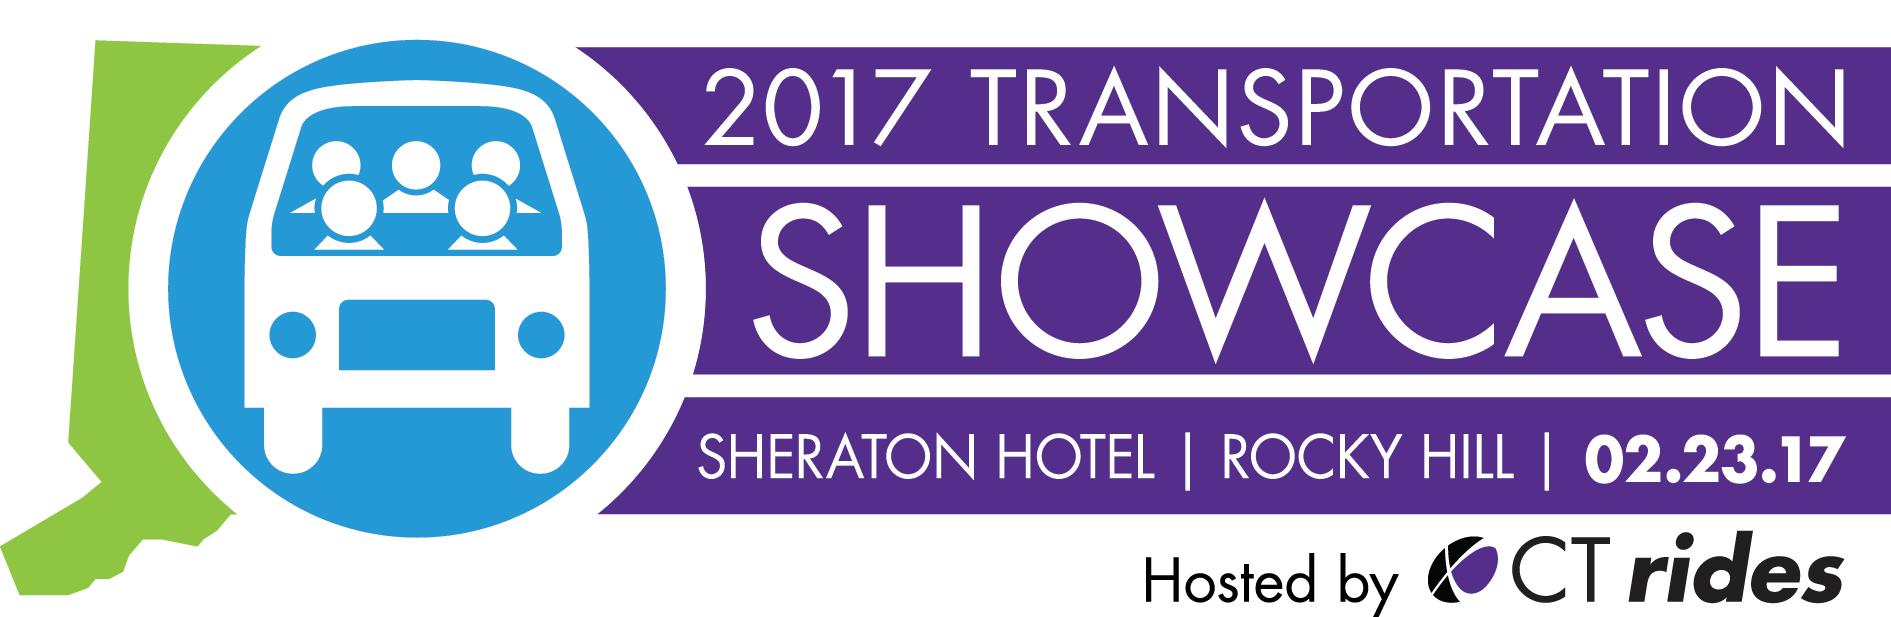 CTrides Transportation Showcase